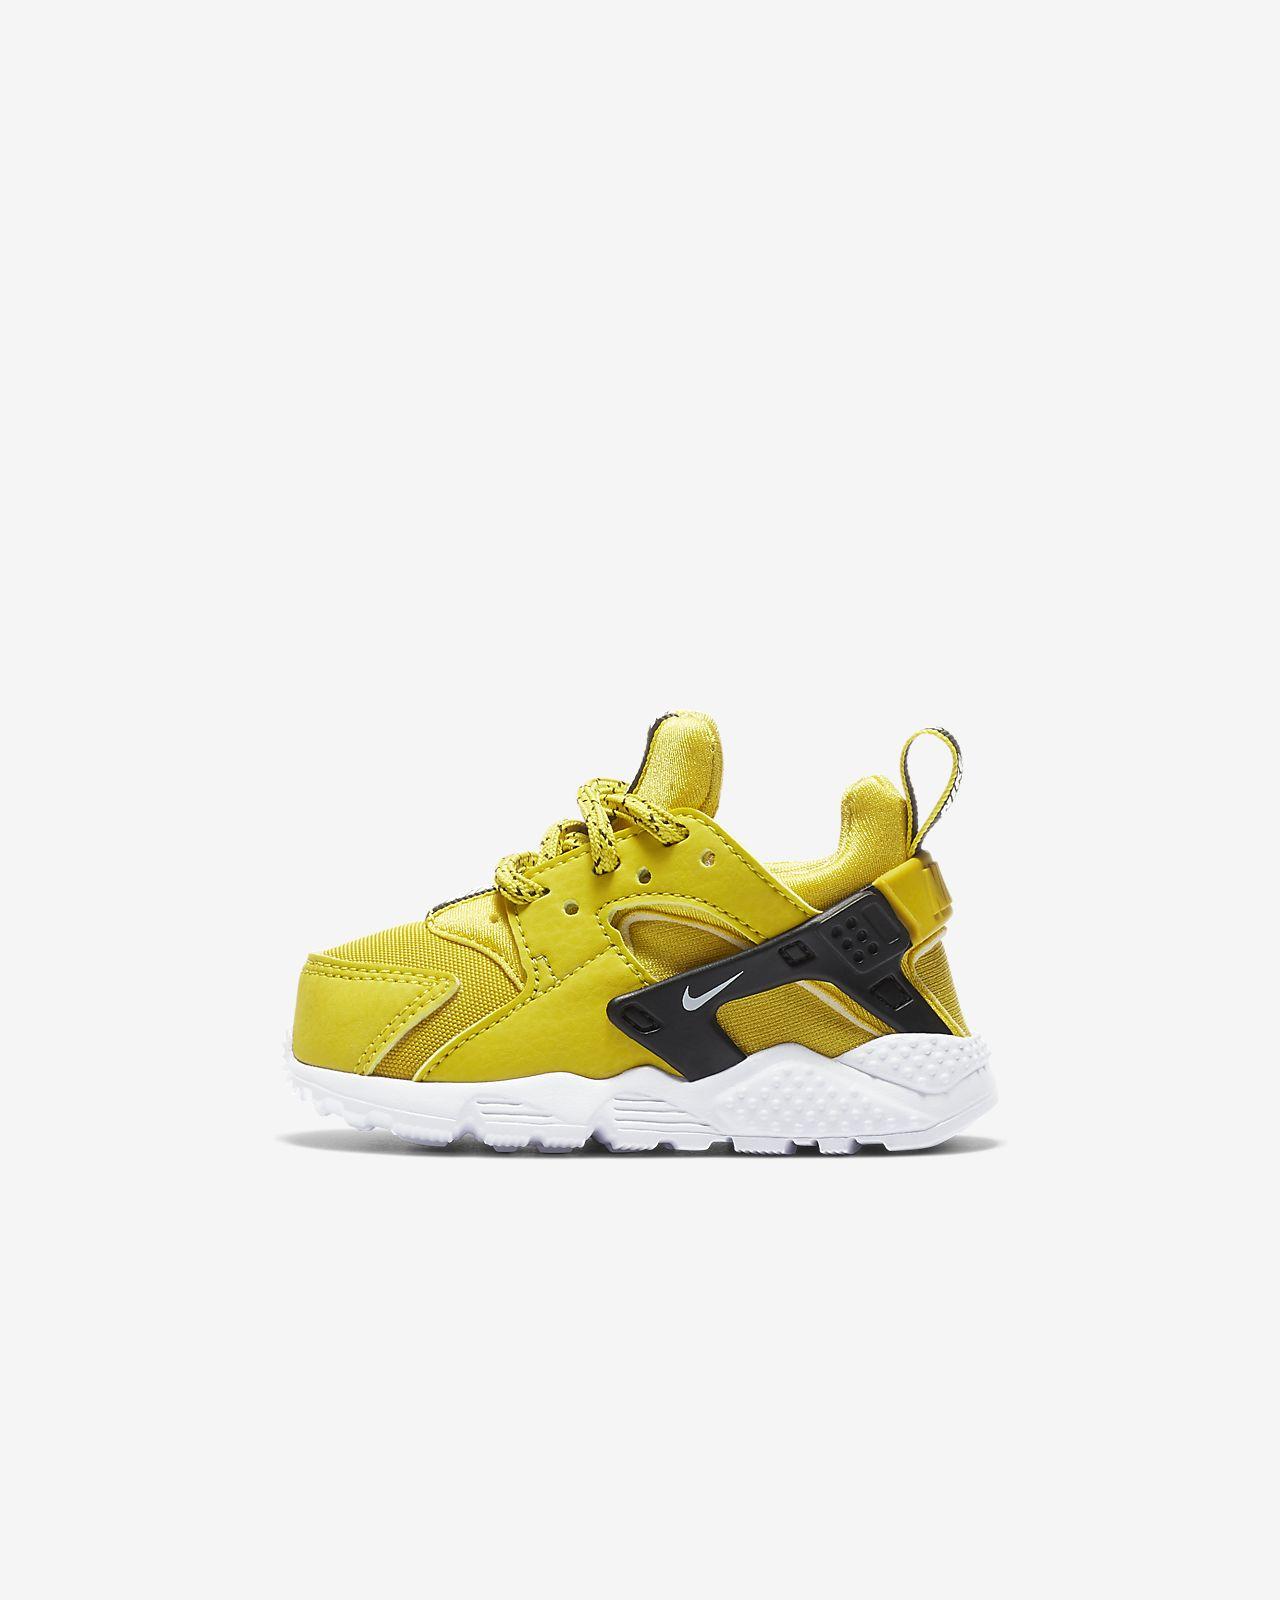 Nike Huarache Run SE Infant/Toddler Shoe